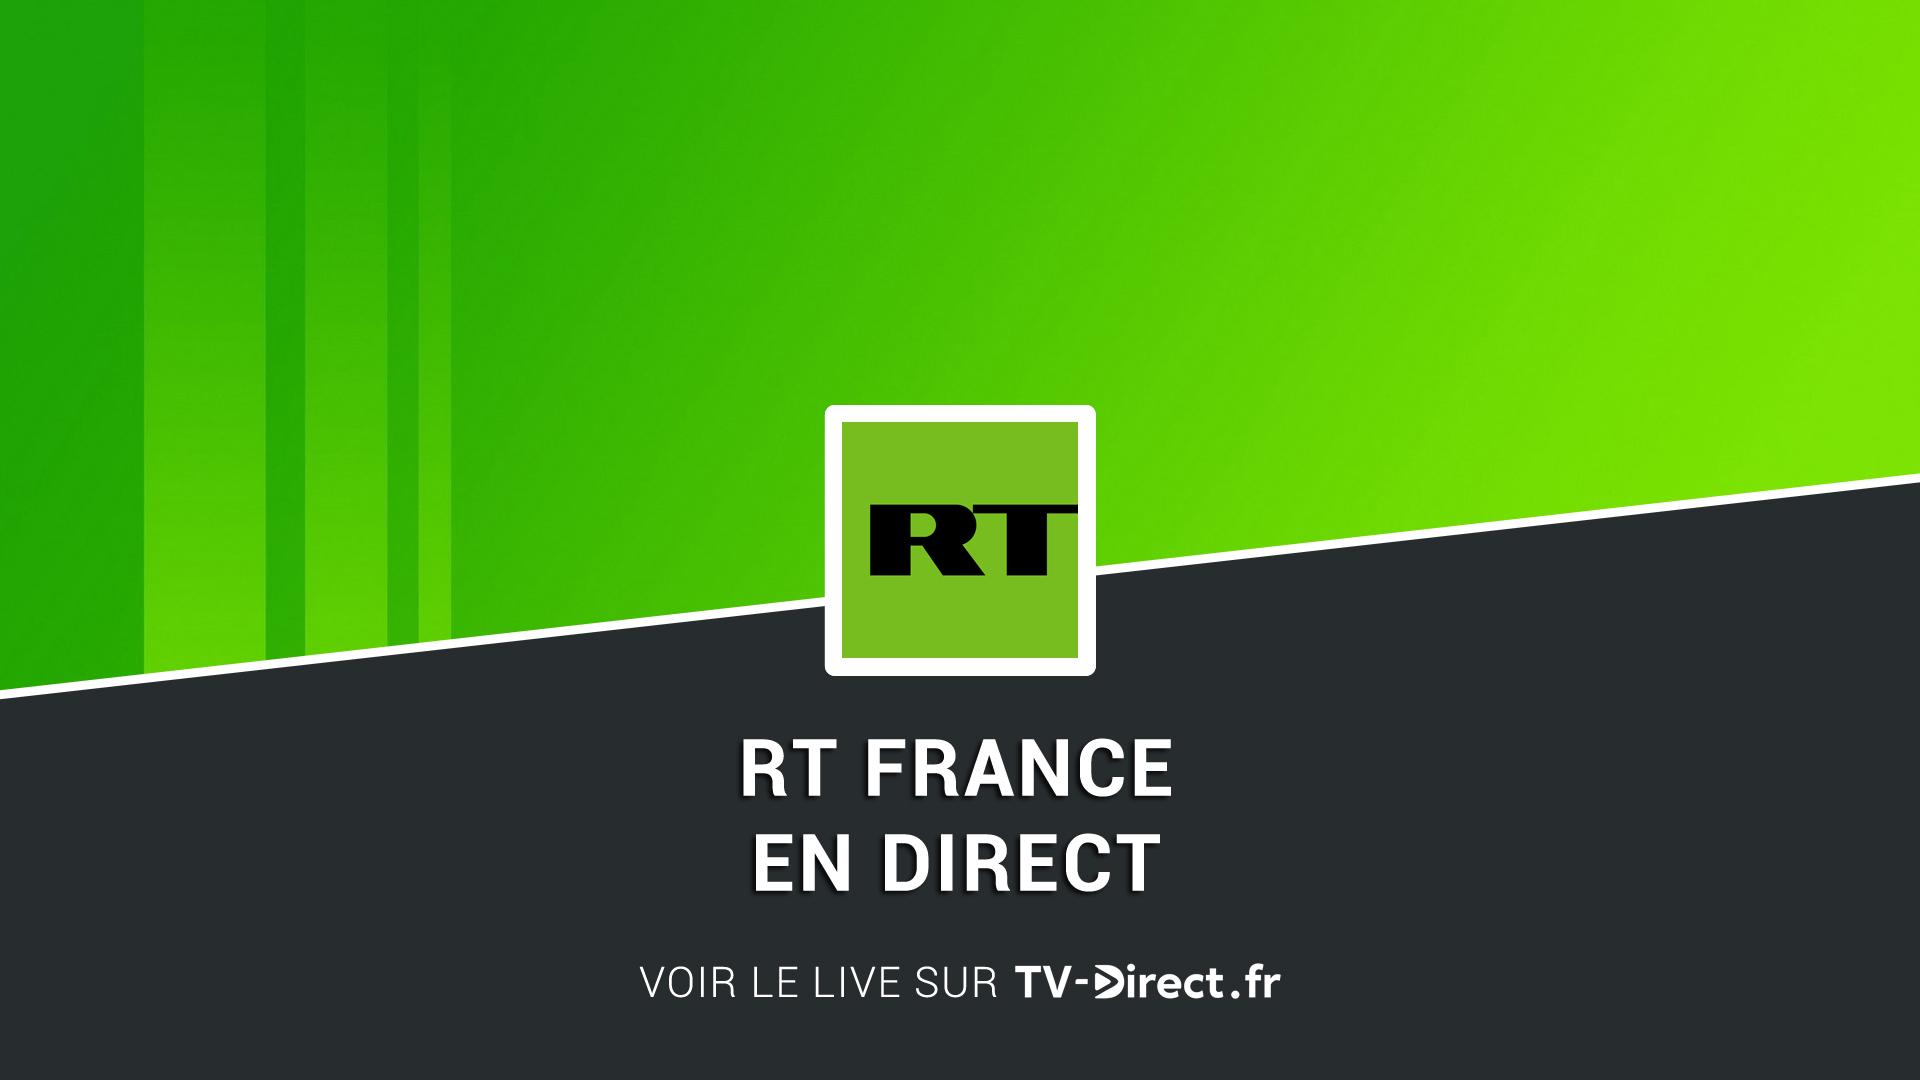 RT France en direct